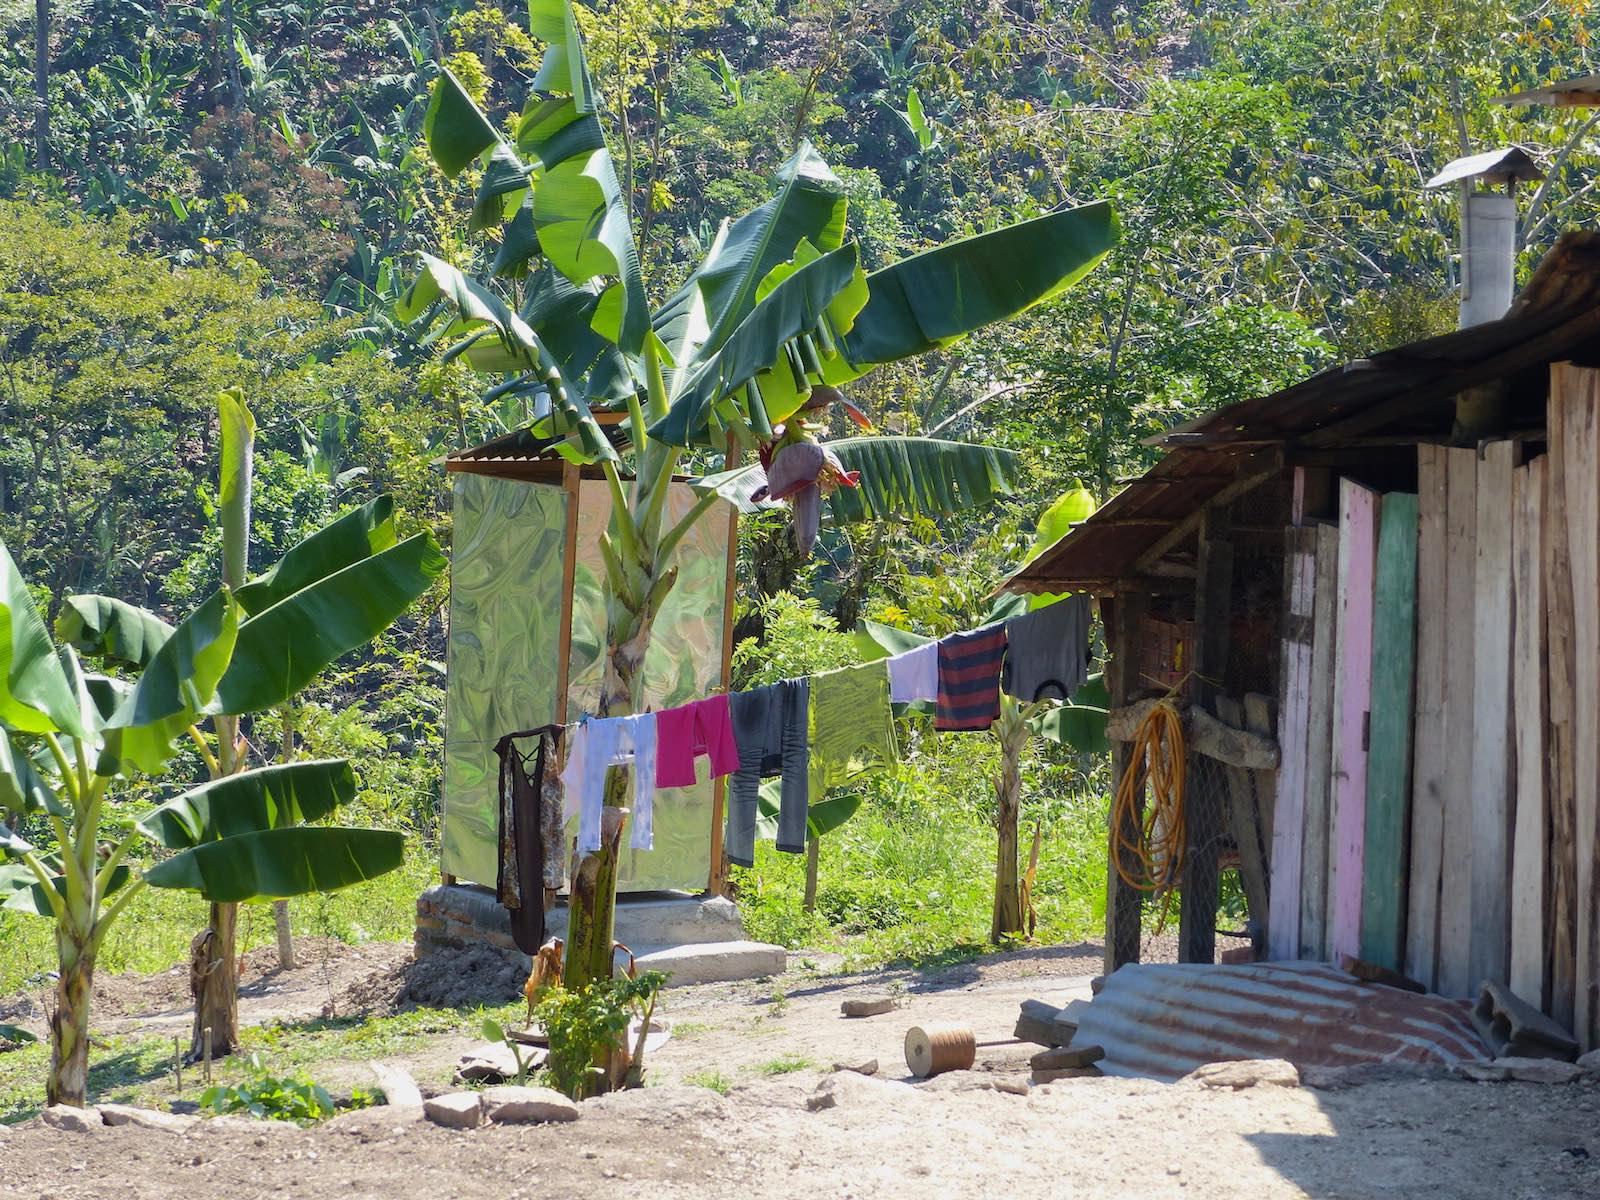 doen in Matagalpa